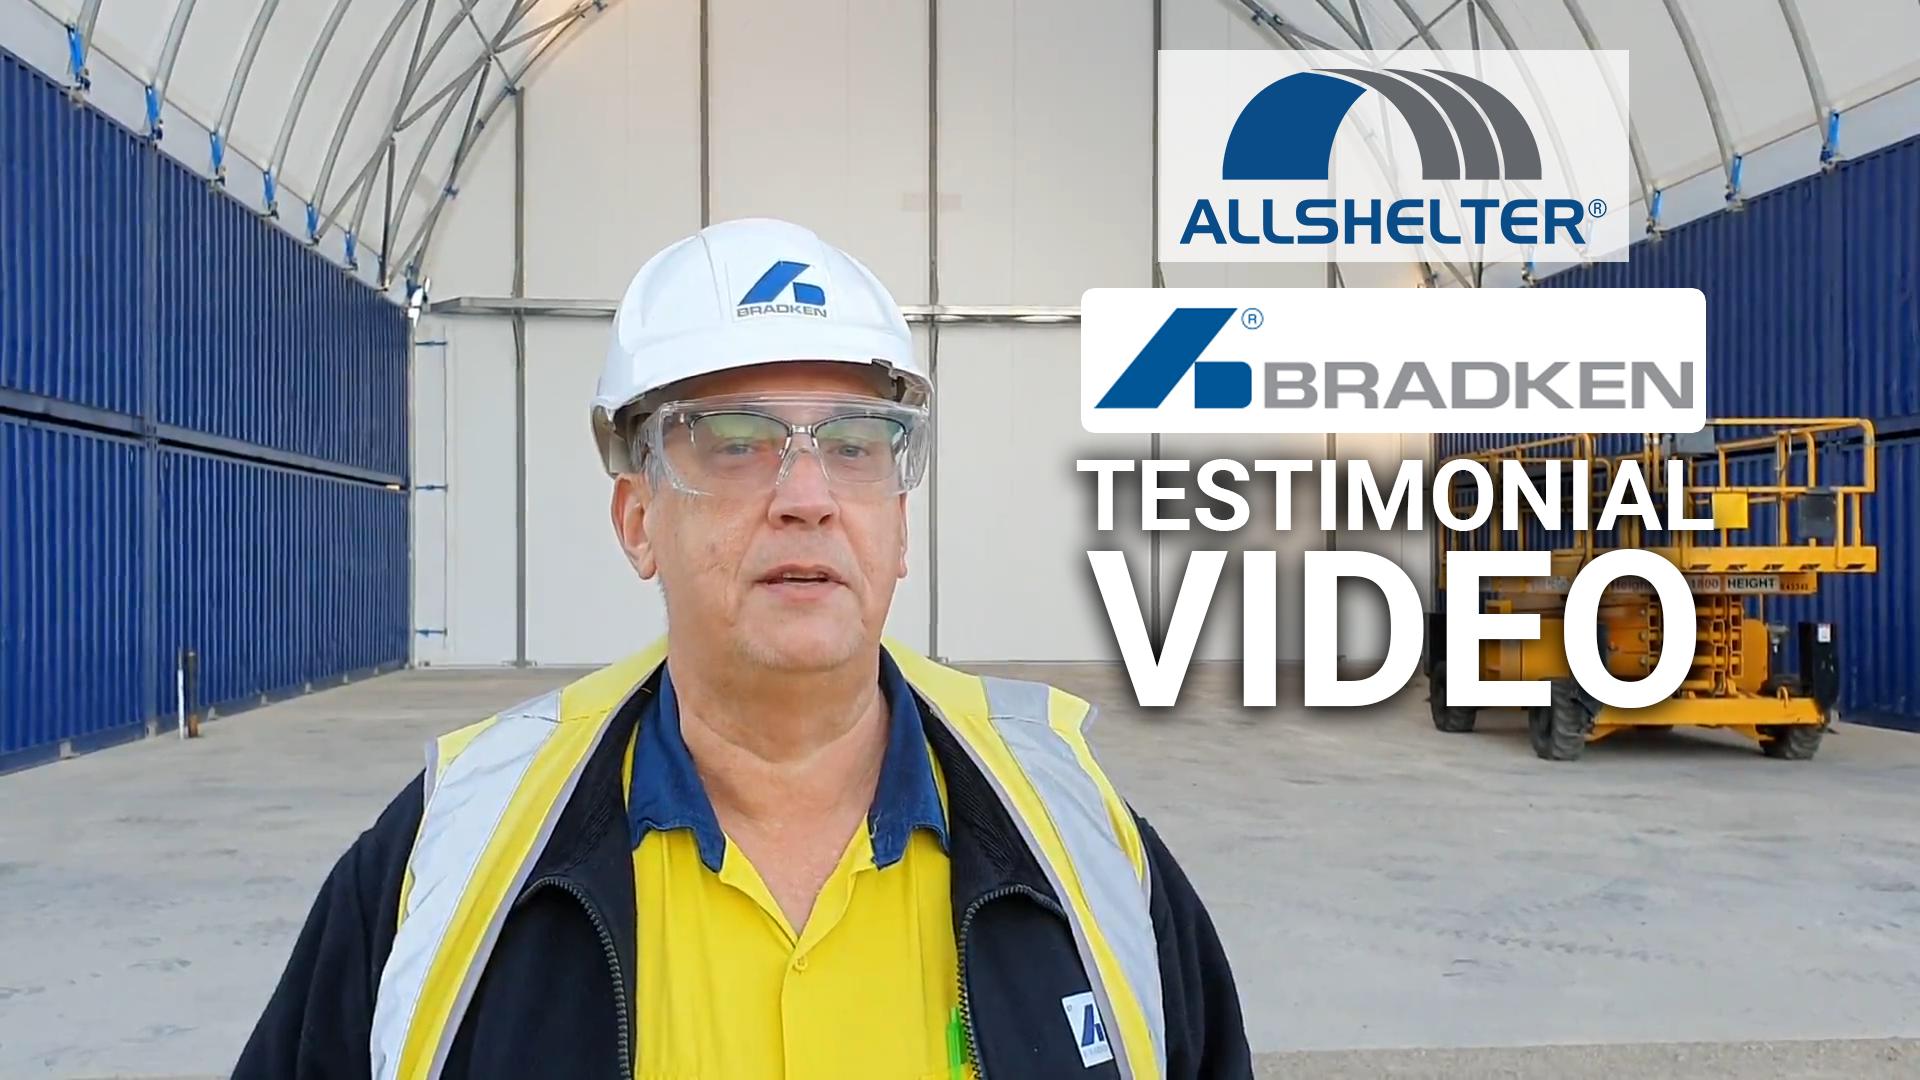 Bradken Testimonial Video